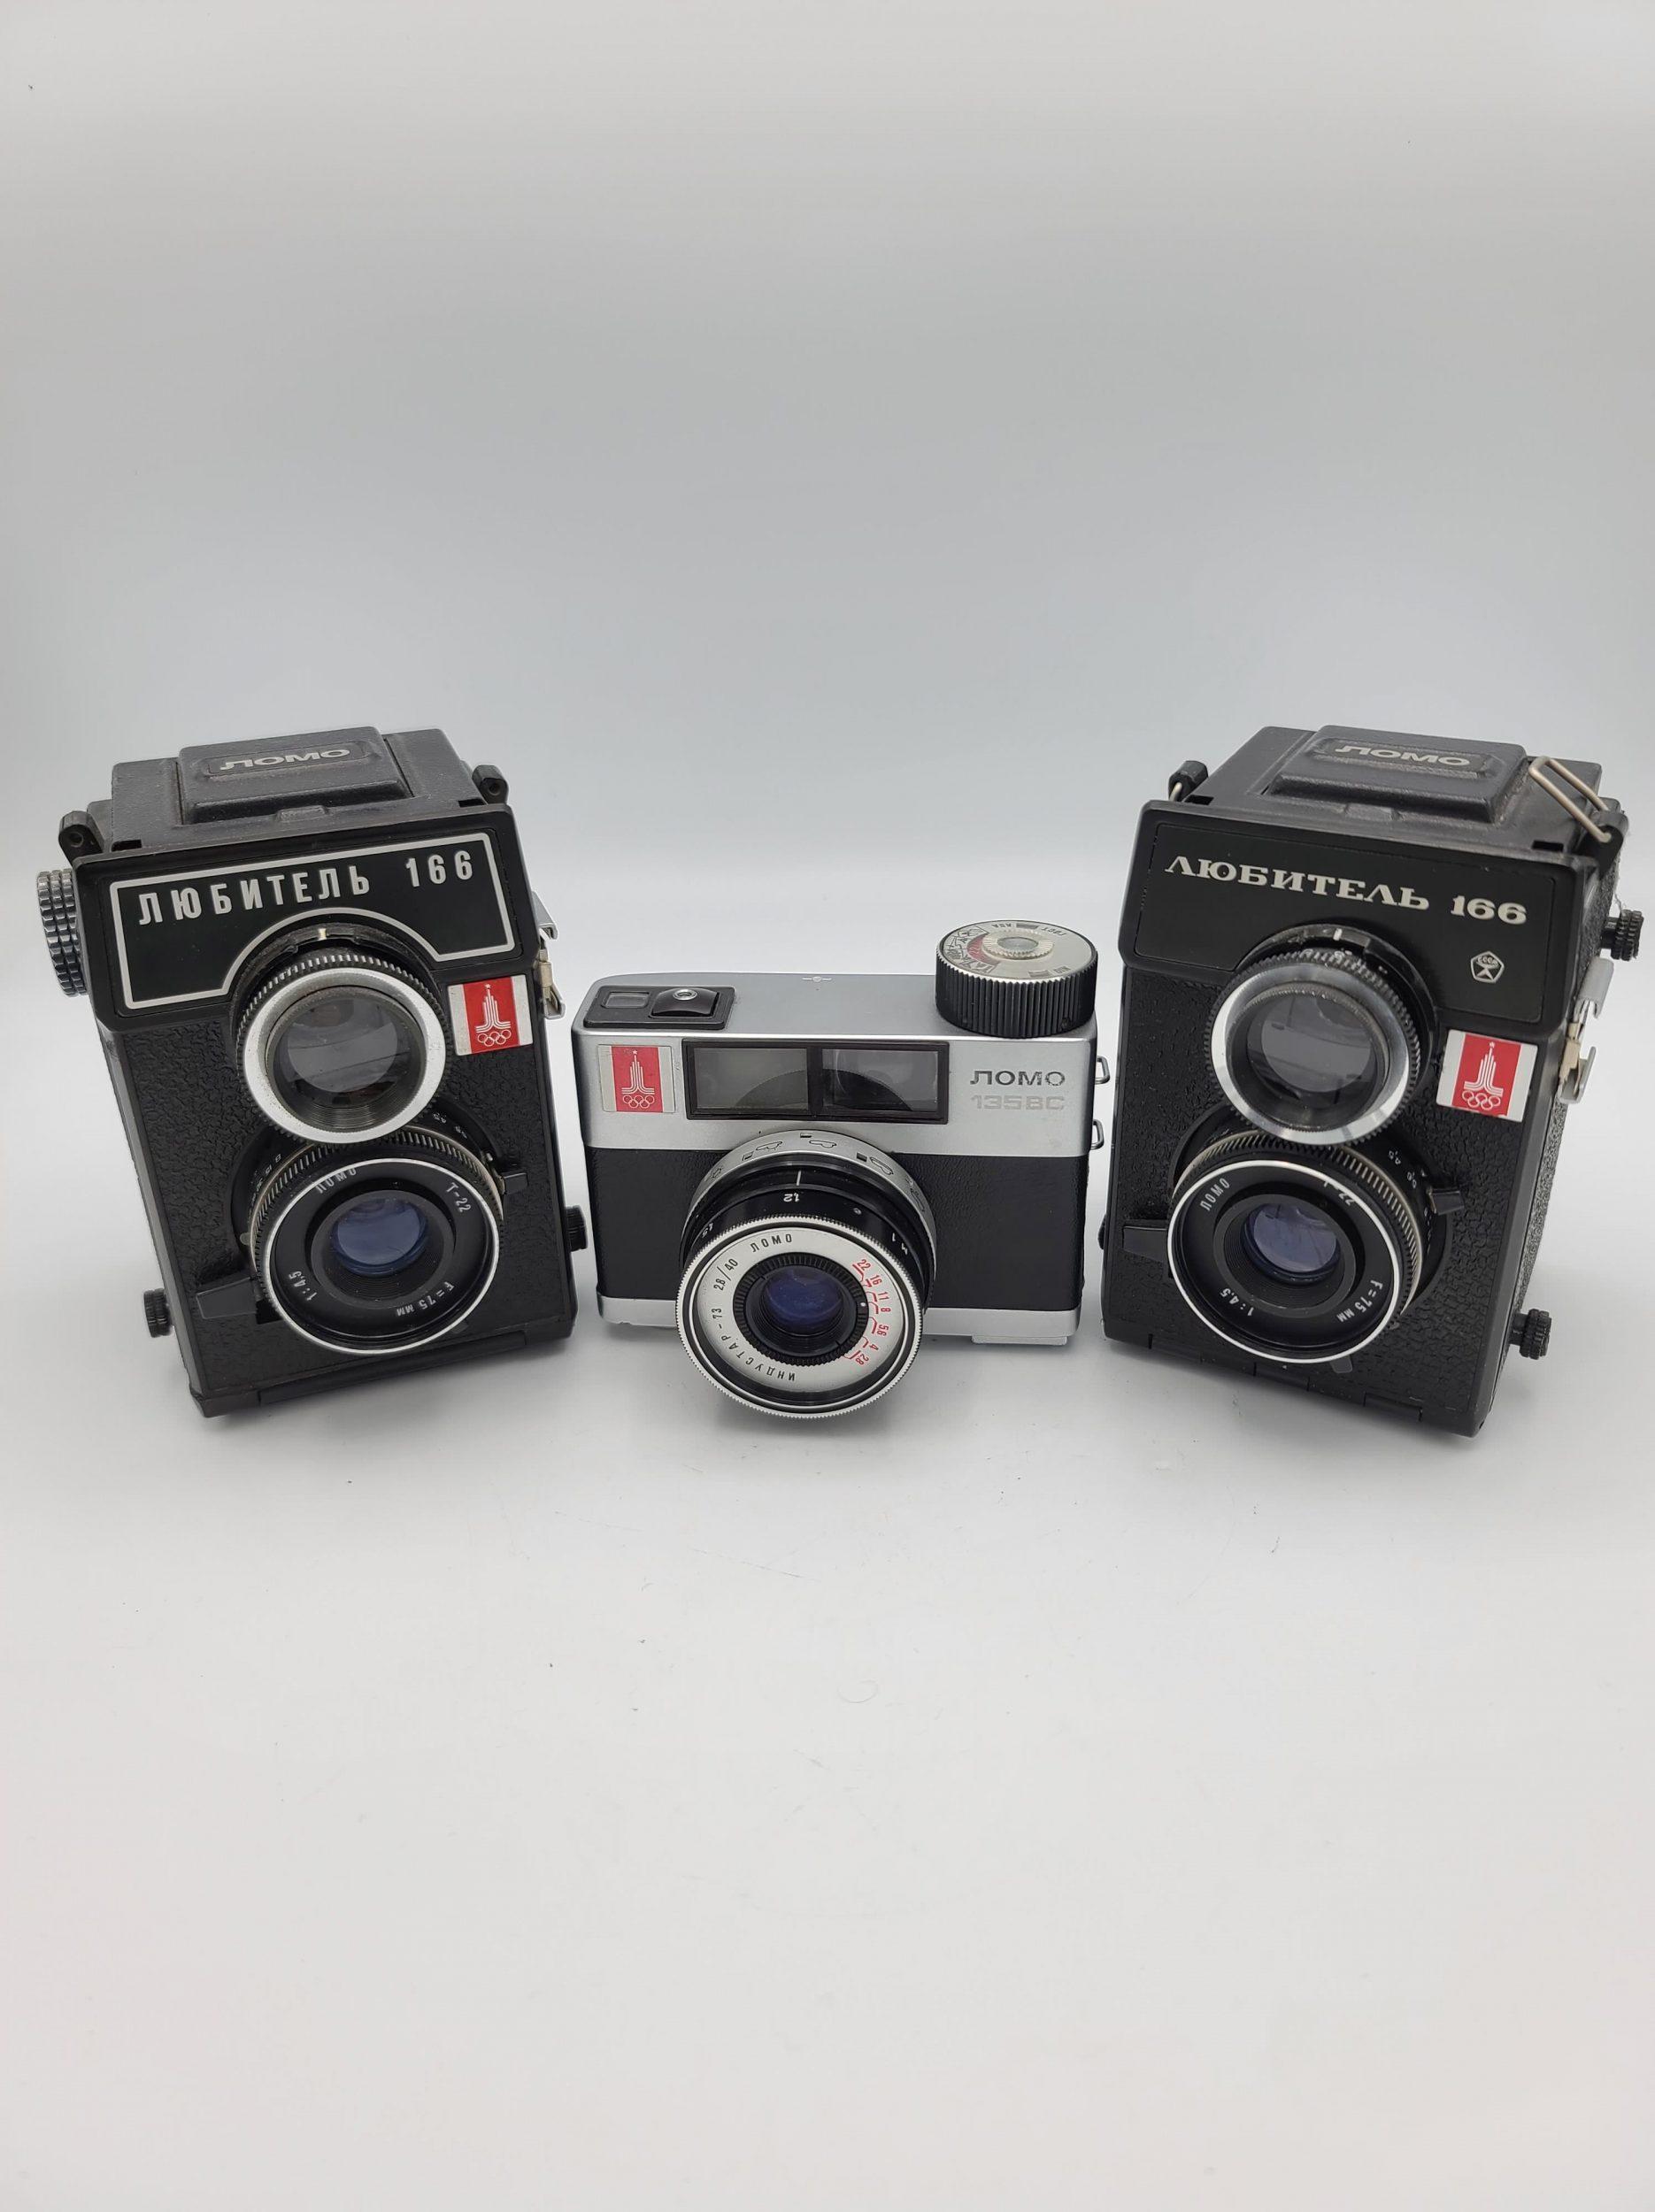 Lomo Olympic cameras (Pic: Vladislav Kern)